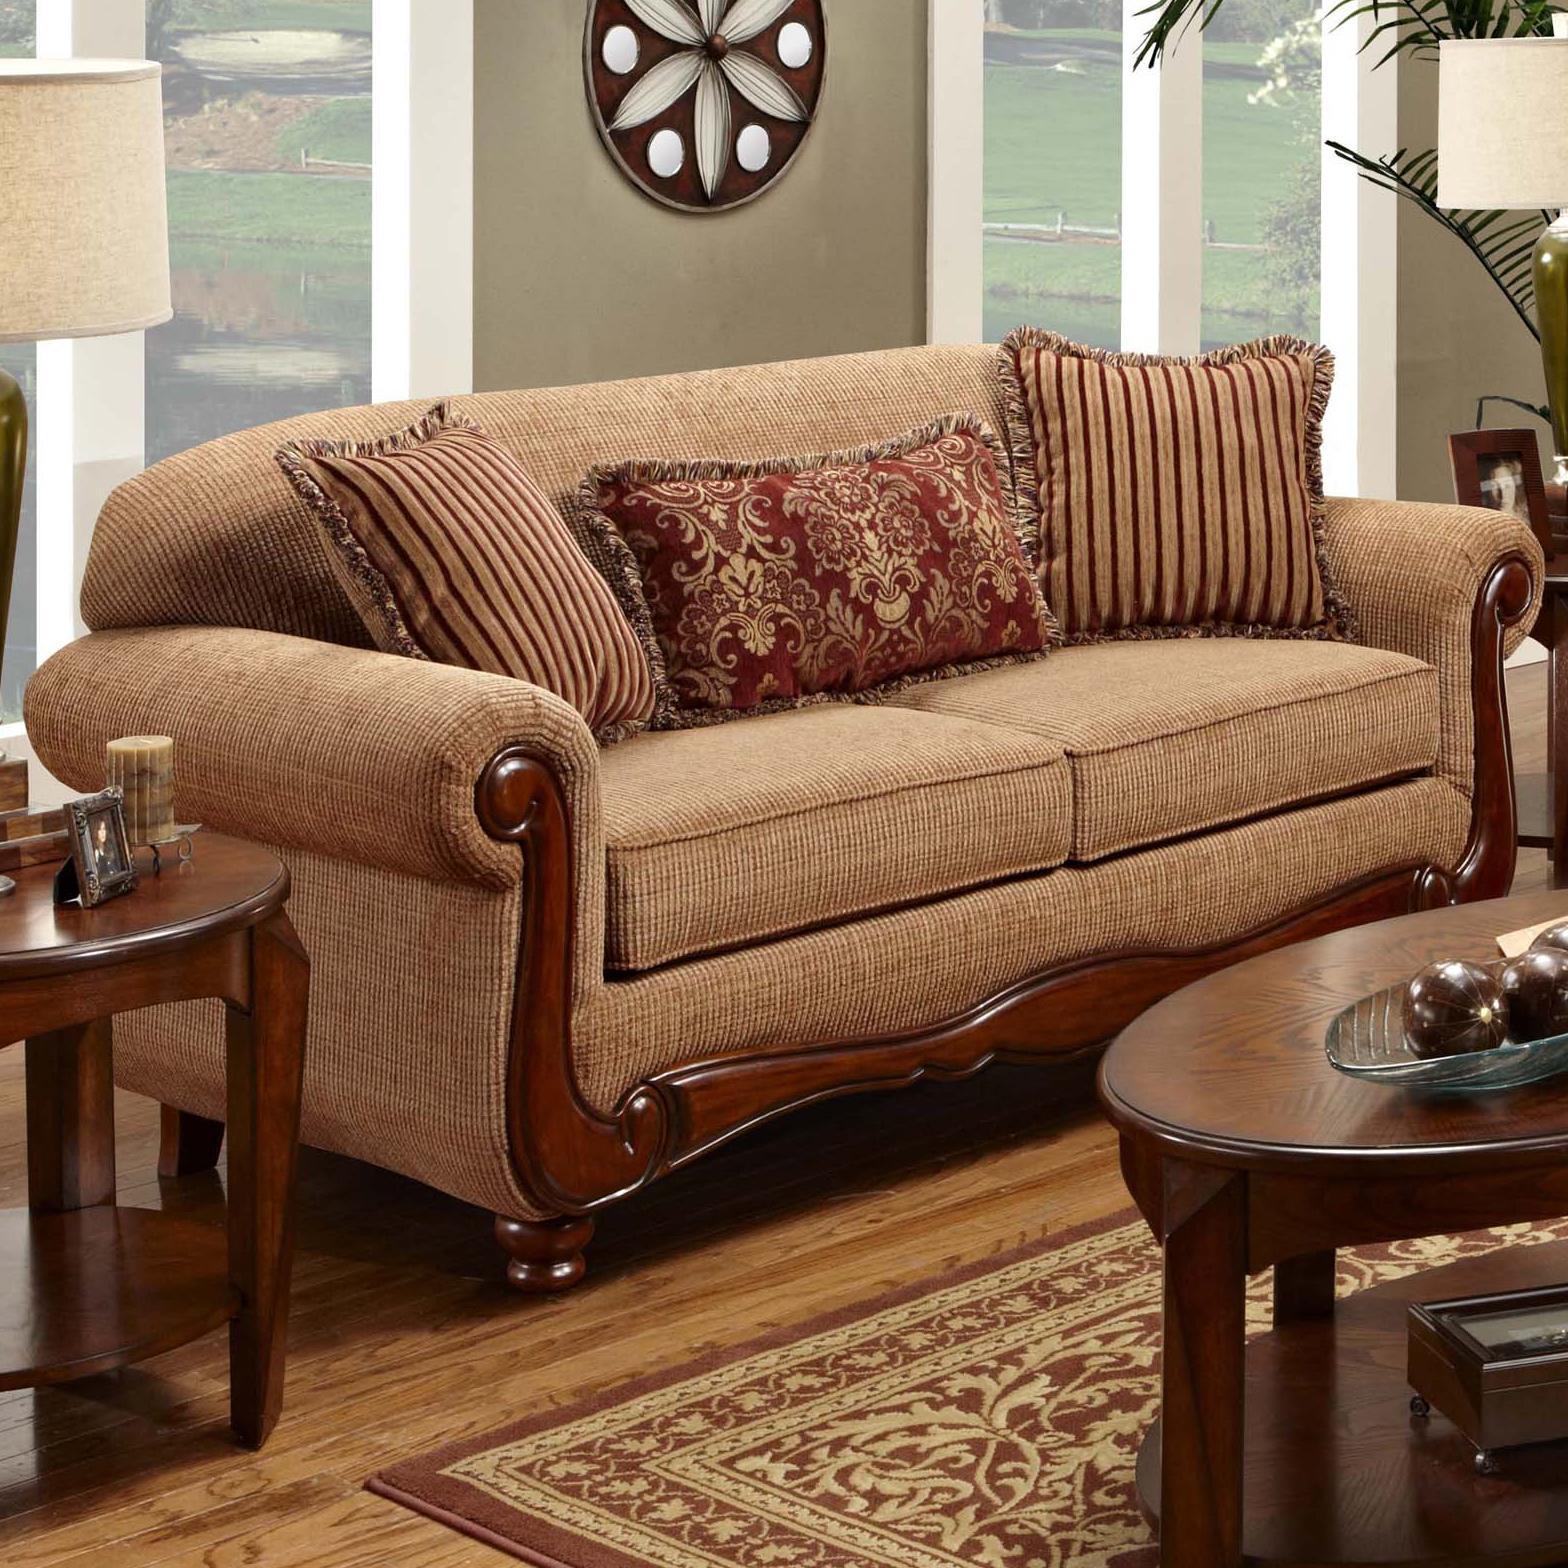 Washington Furniture 1000 Traditional Sofa With Rolled Arms   Adcock  Furniture   Sofa